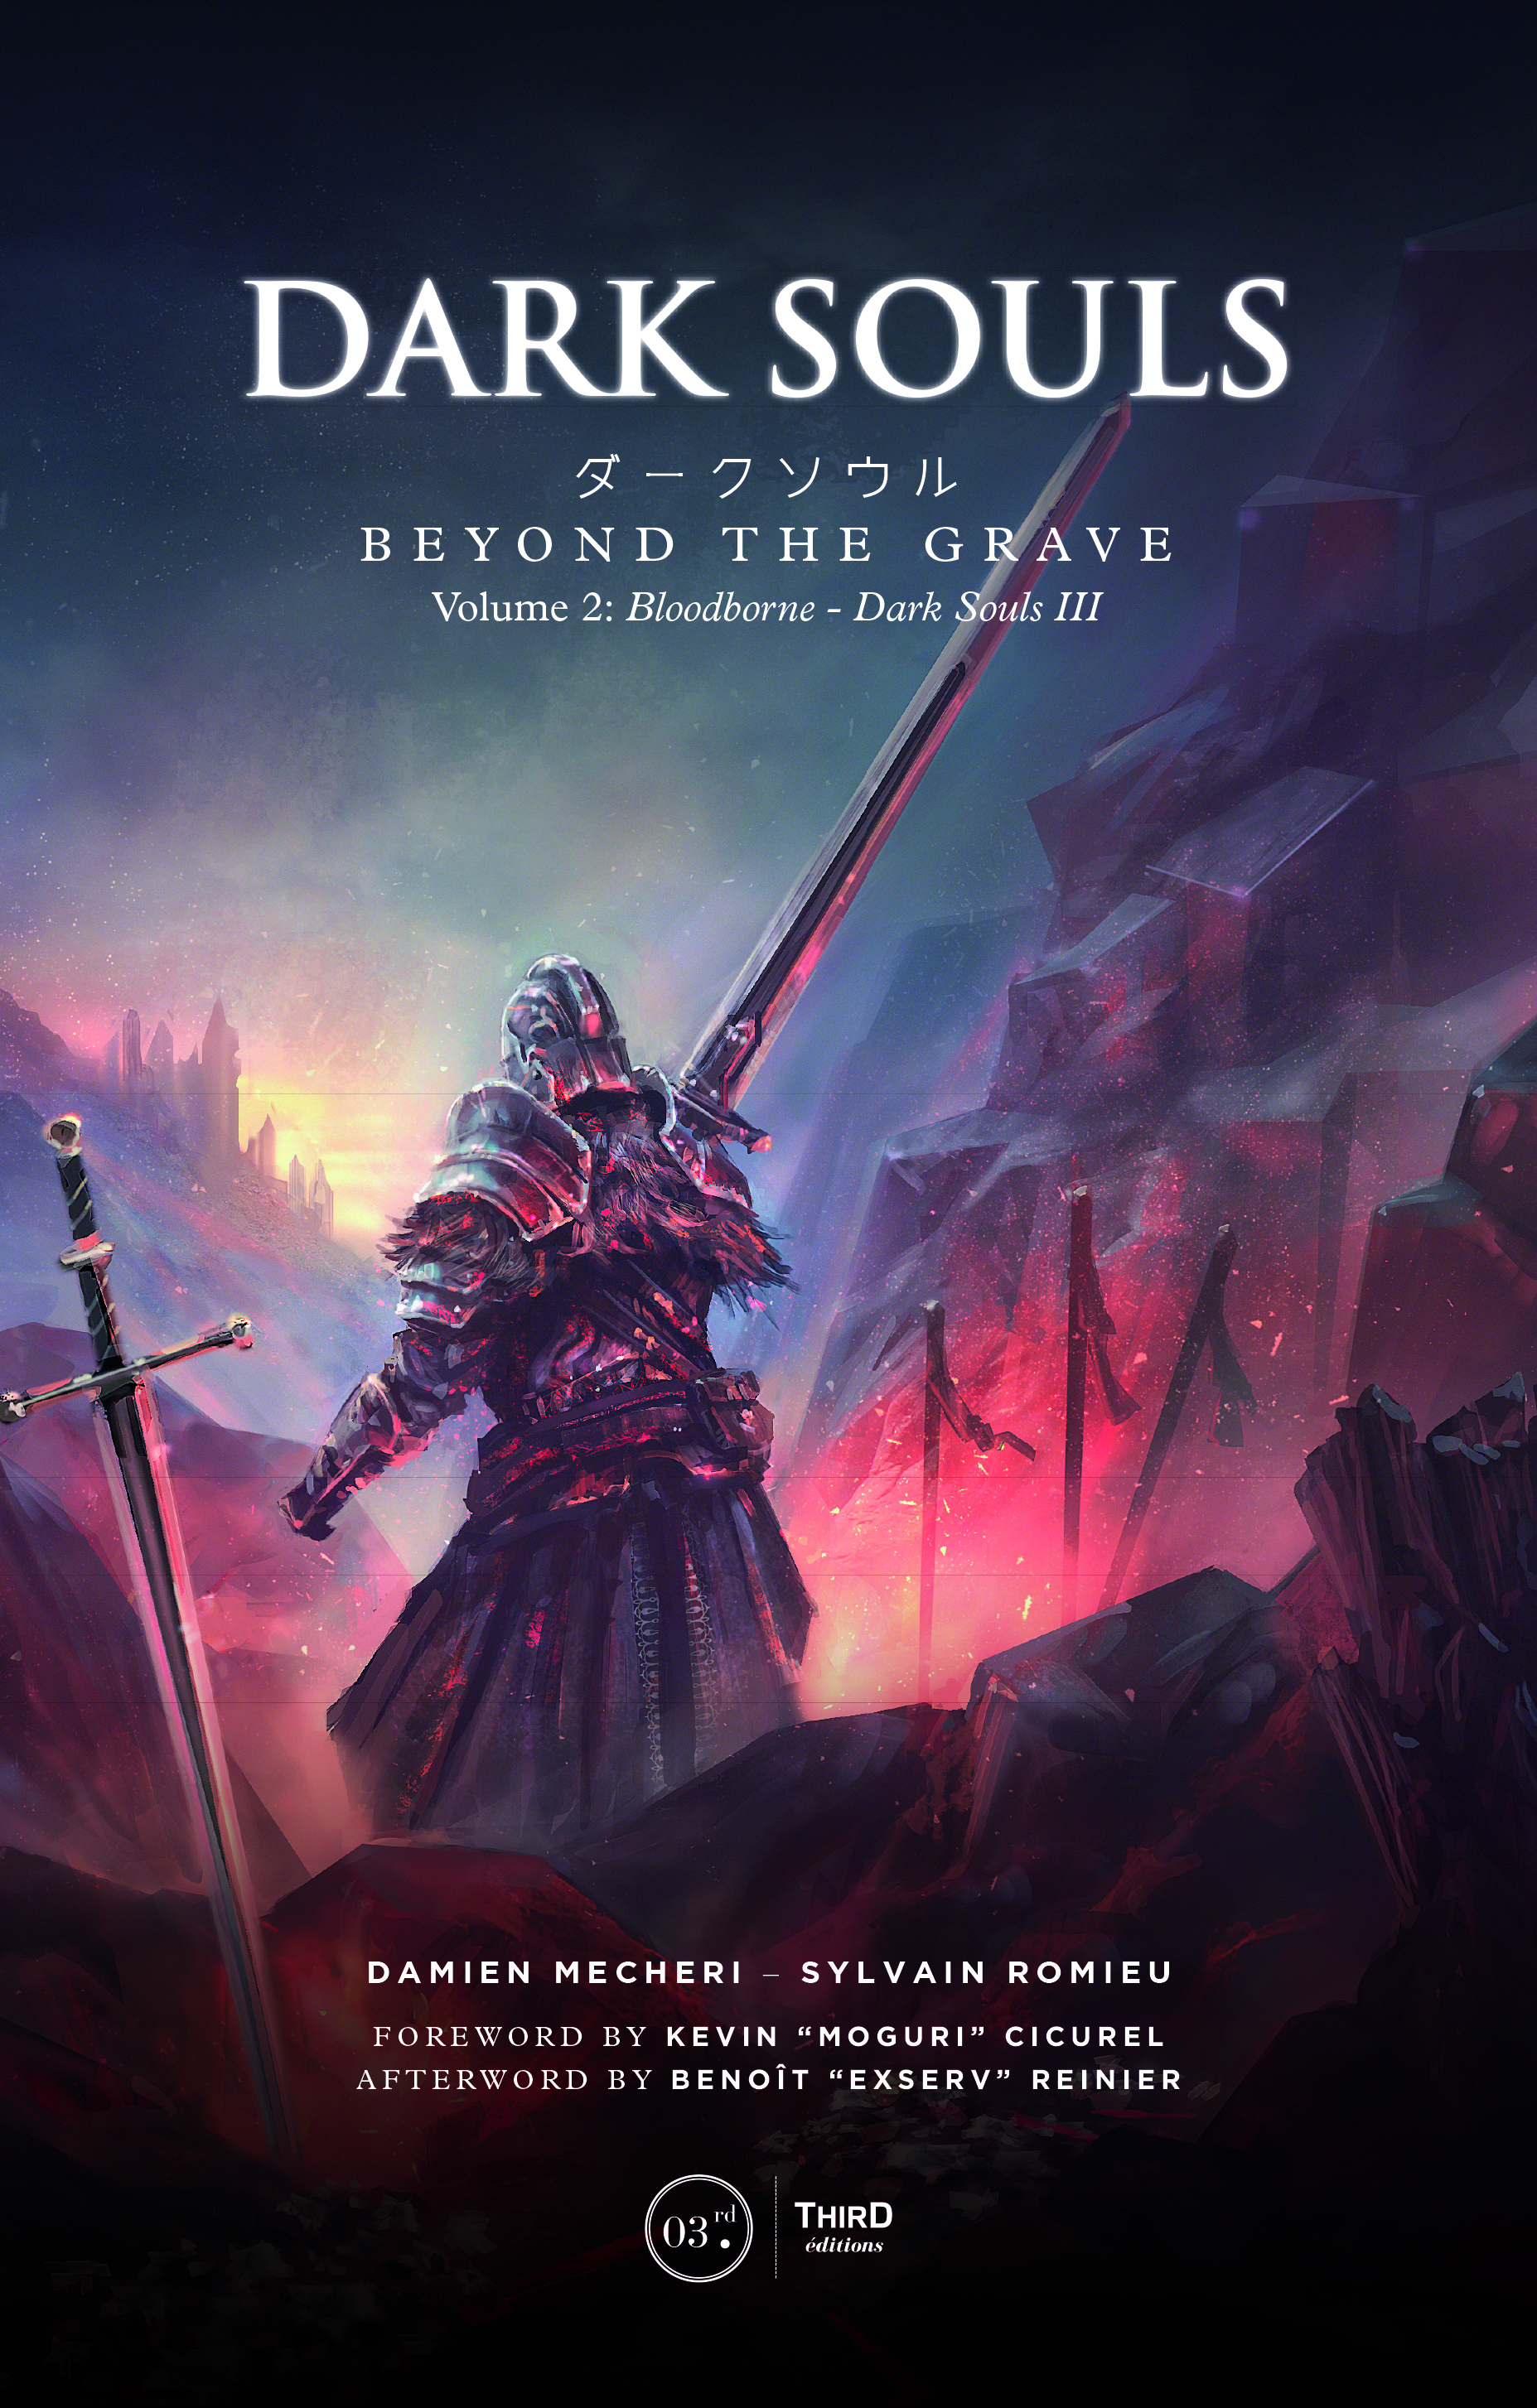 Dark Souls. Beyond the Grave Vol. 2